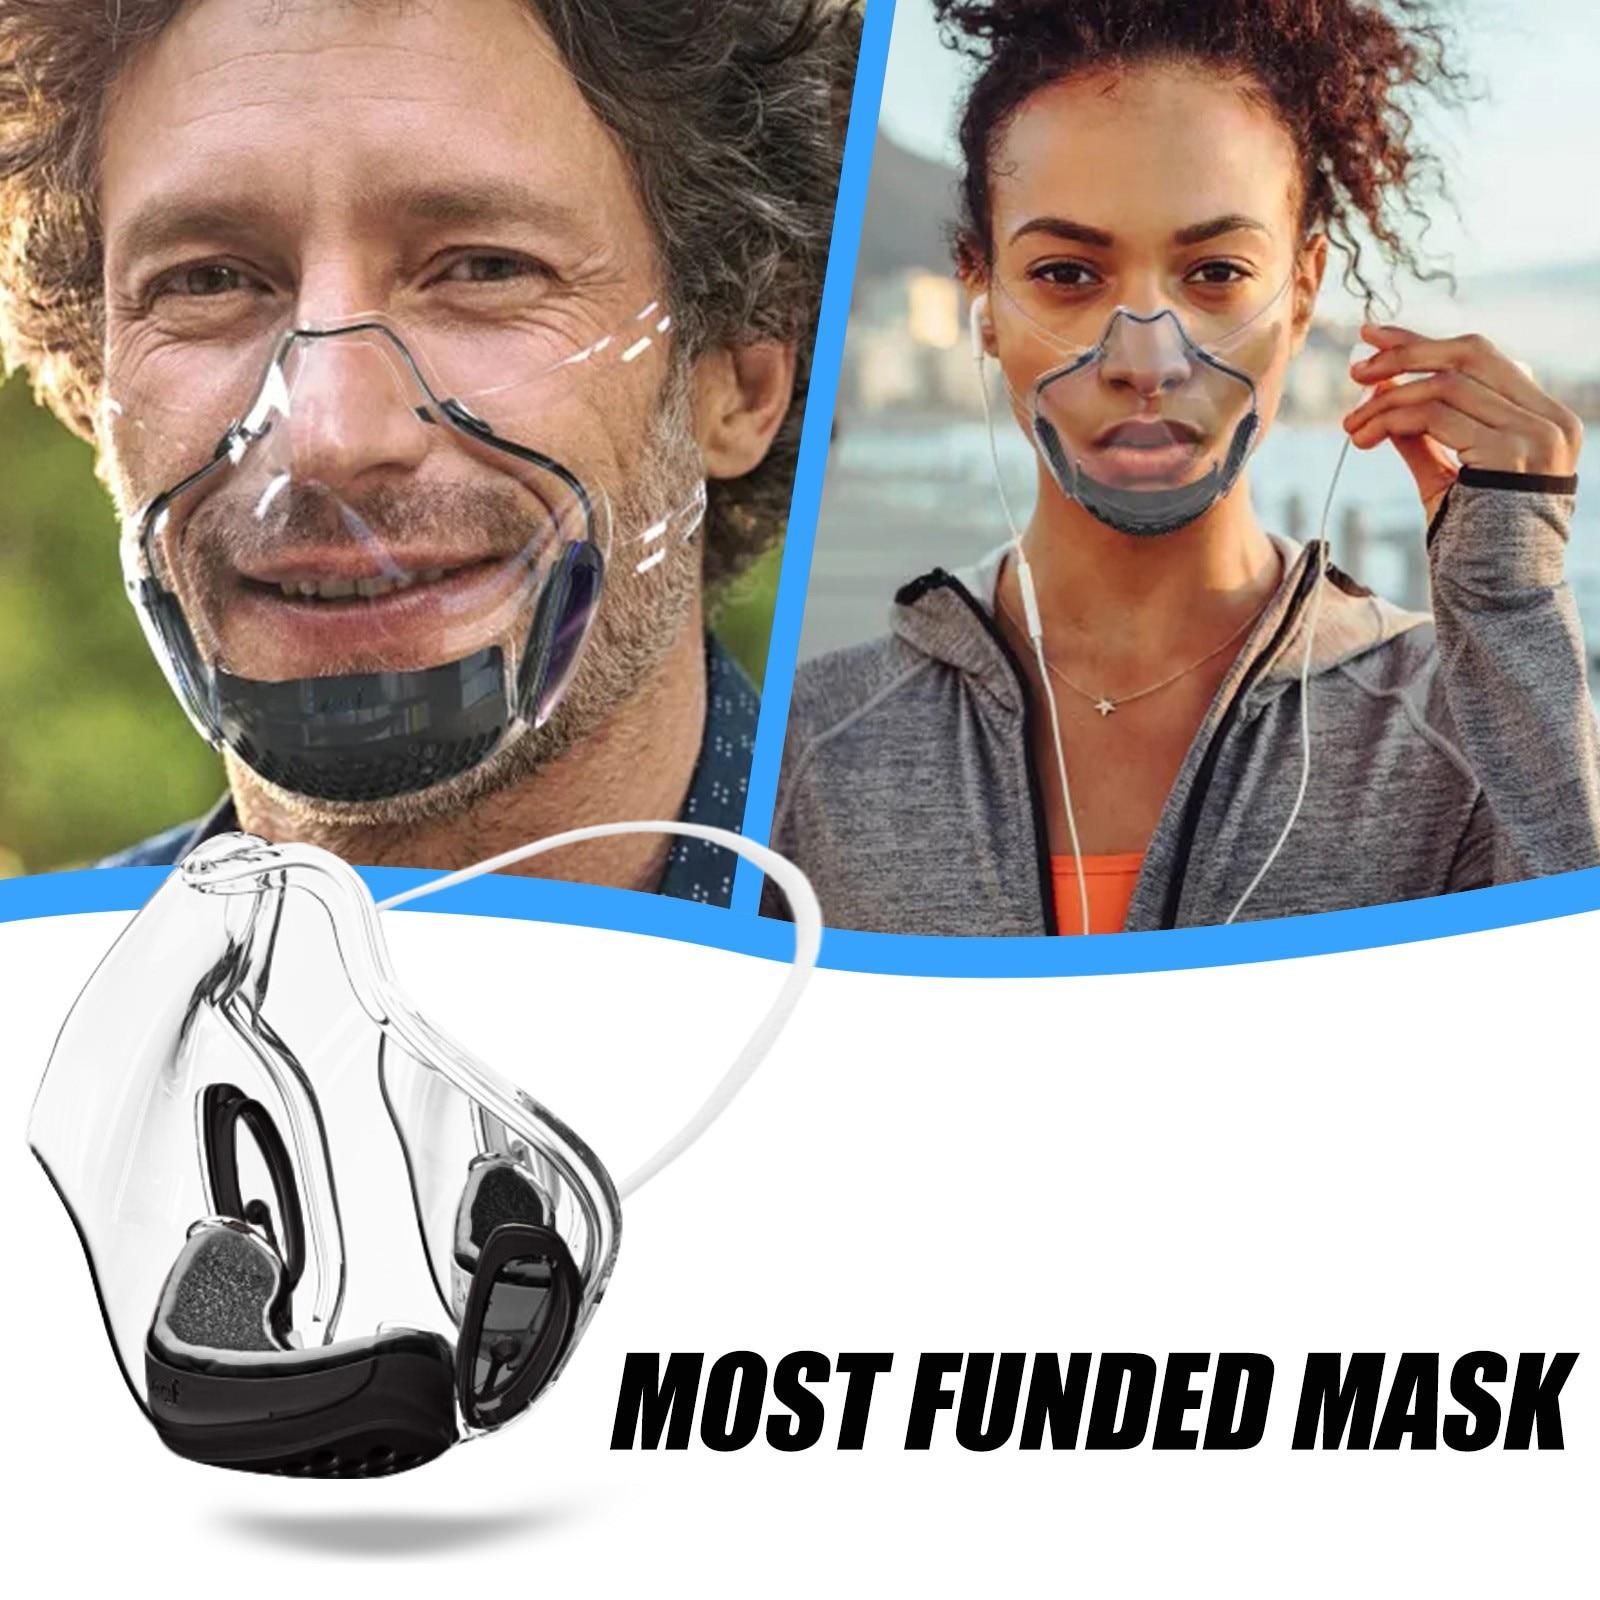 1pcs Face Mask For Adults A RADICAL ALTERNATIVES TRANSPARENT SHIELD AND RESPIRATOR Transparent Mask